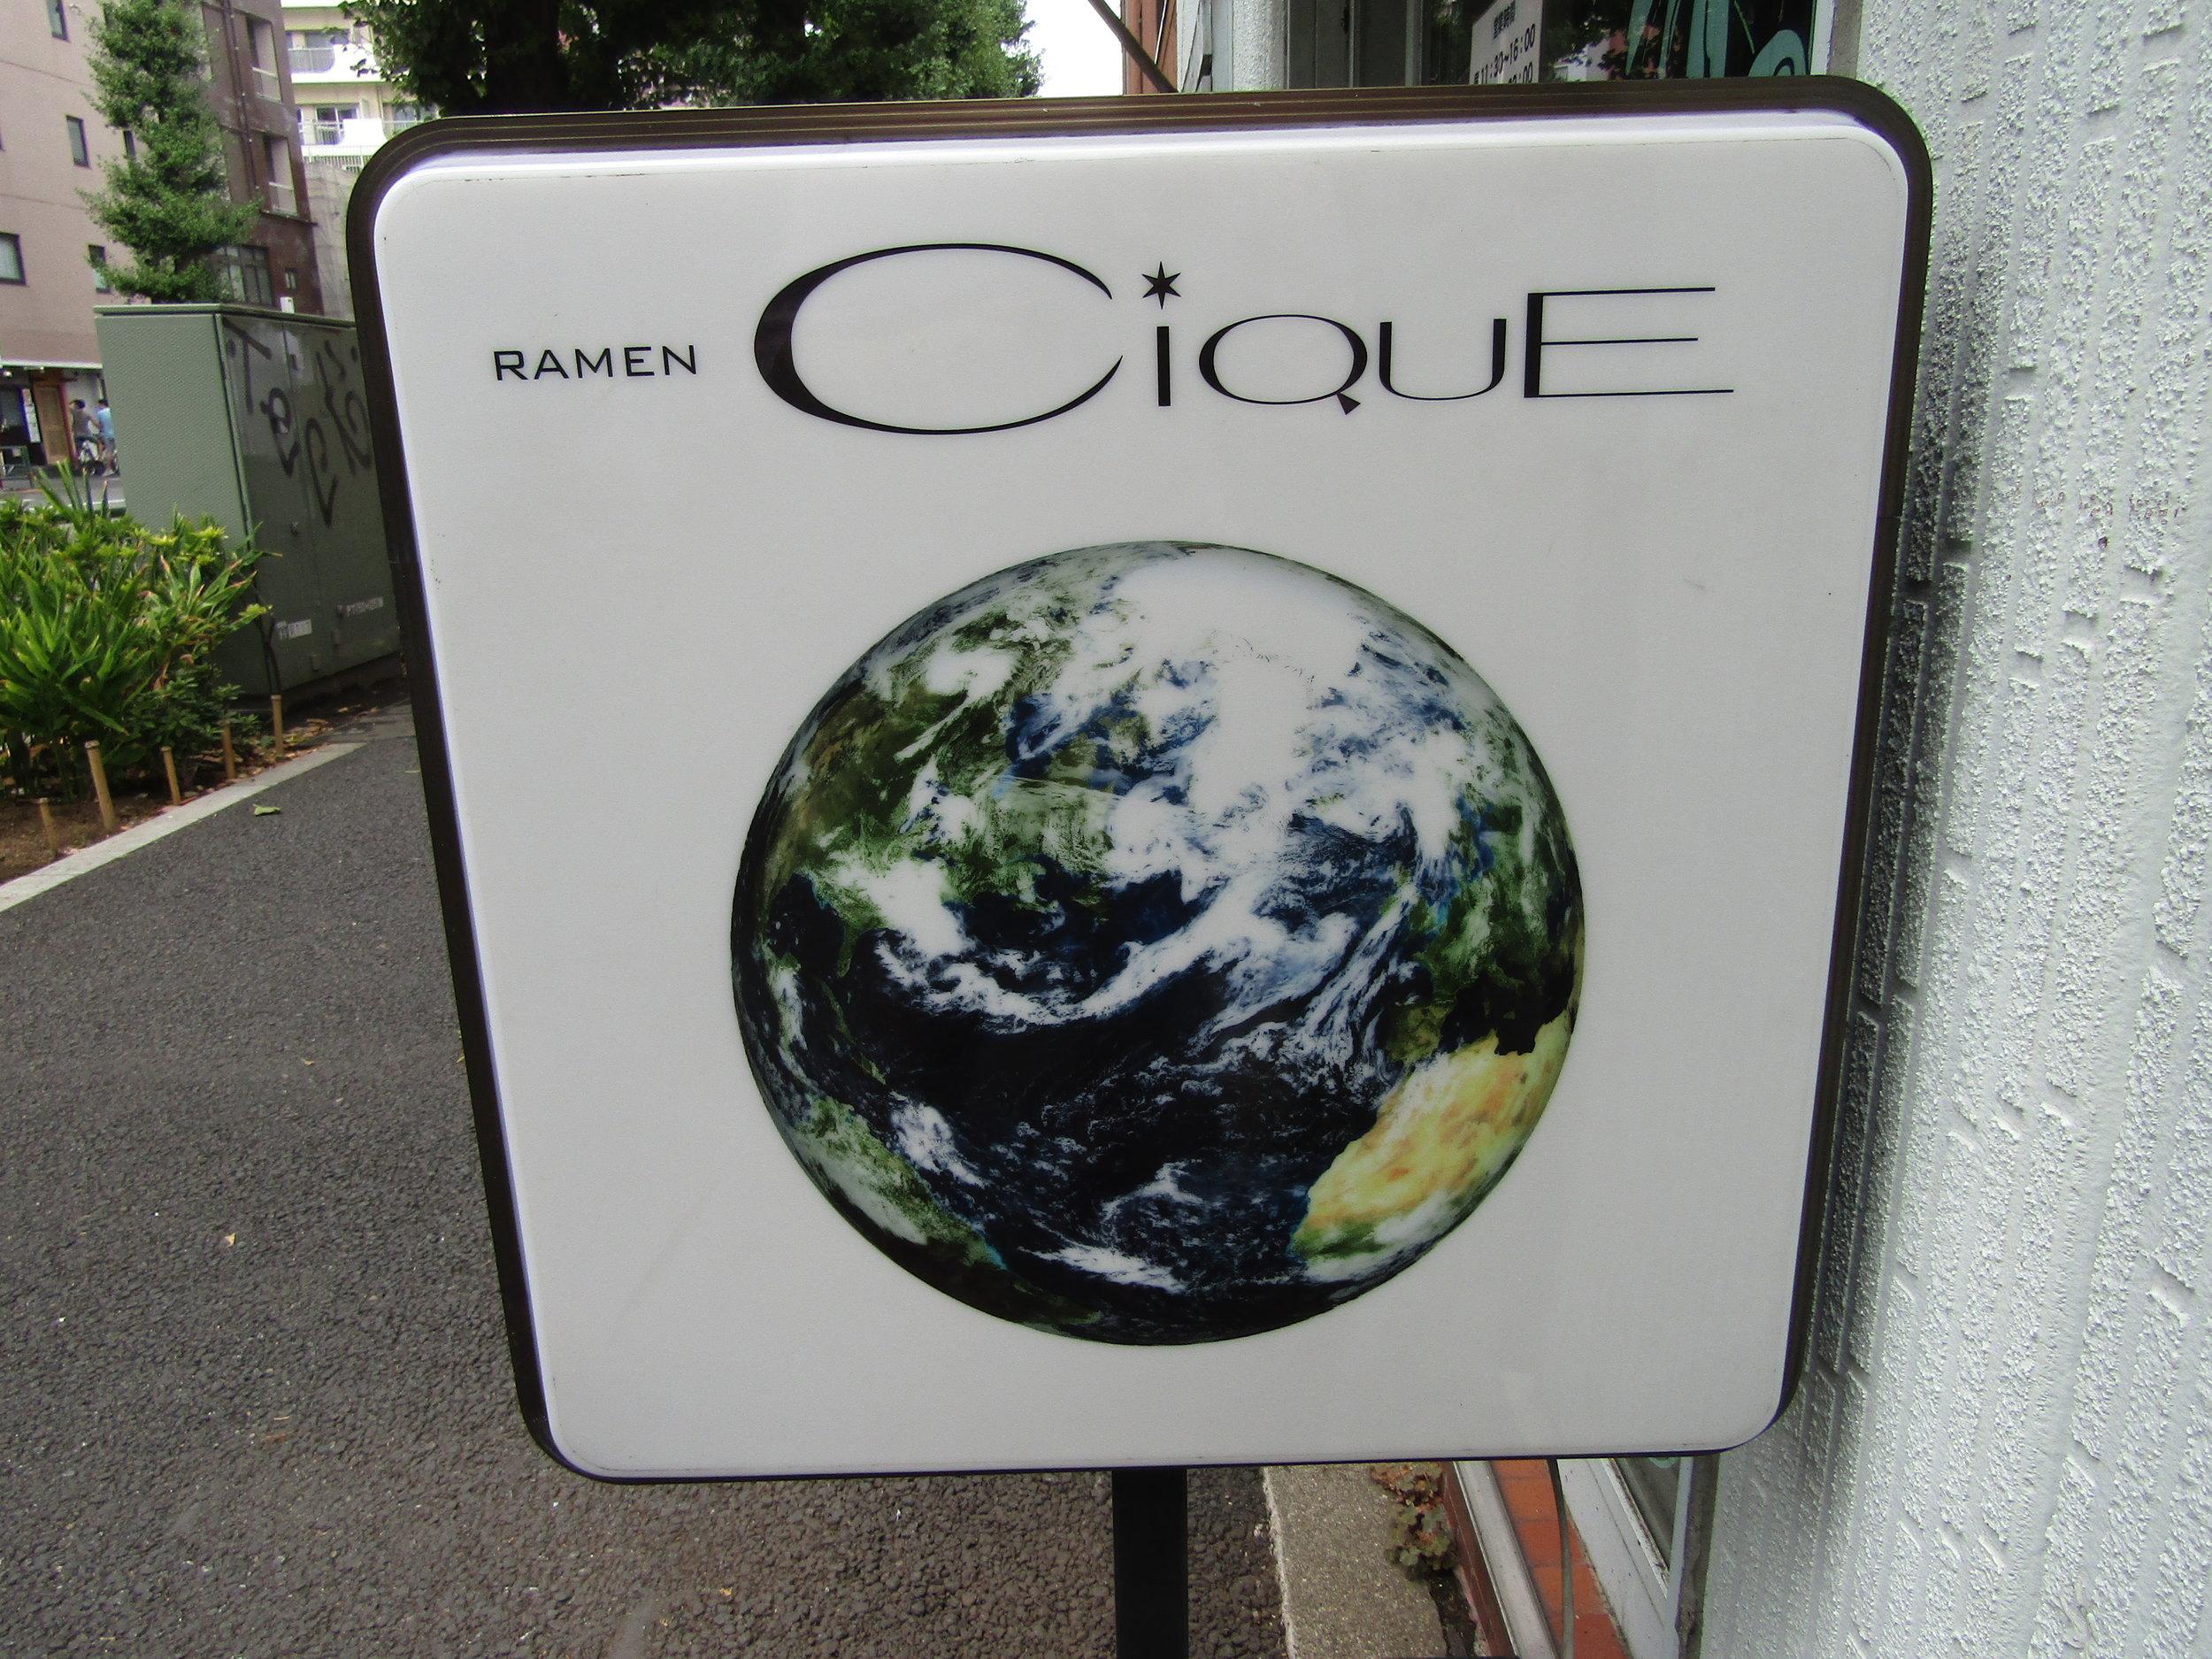 Ramen Cique Sign 6.JPG